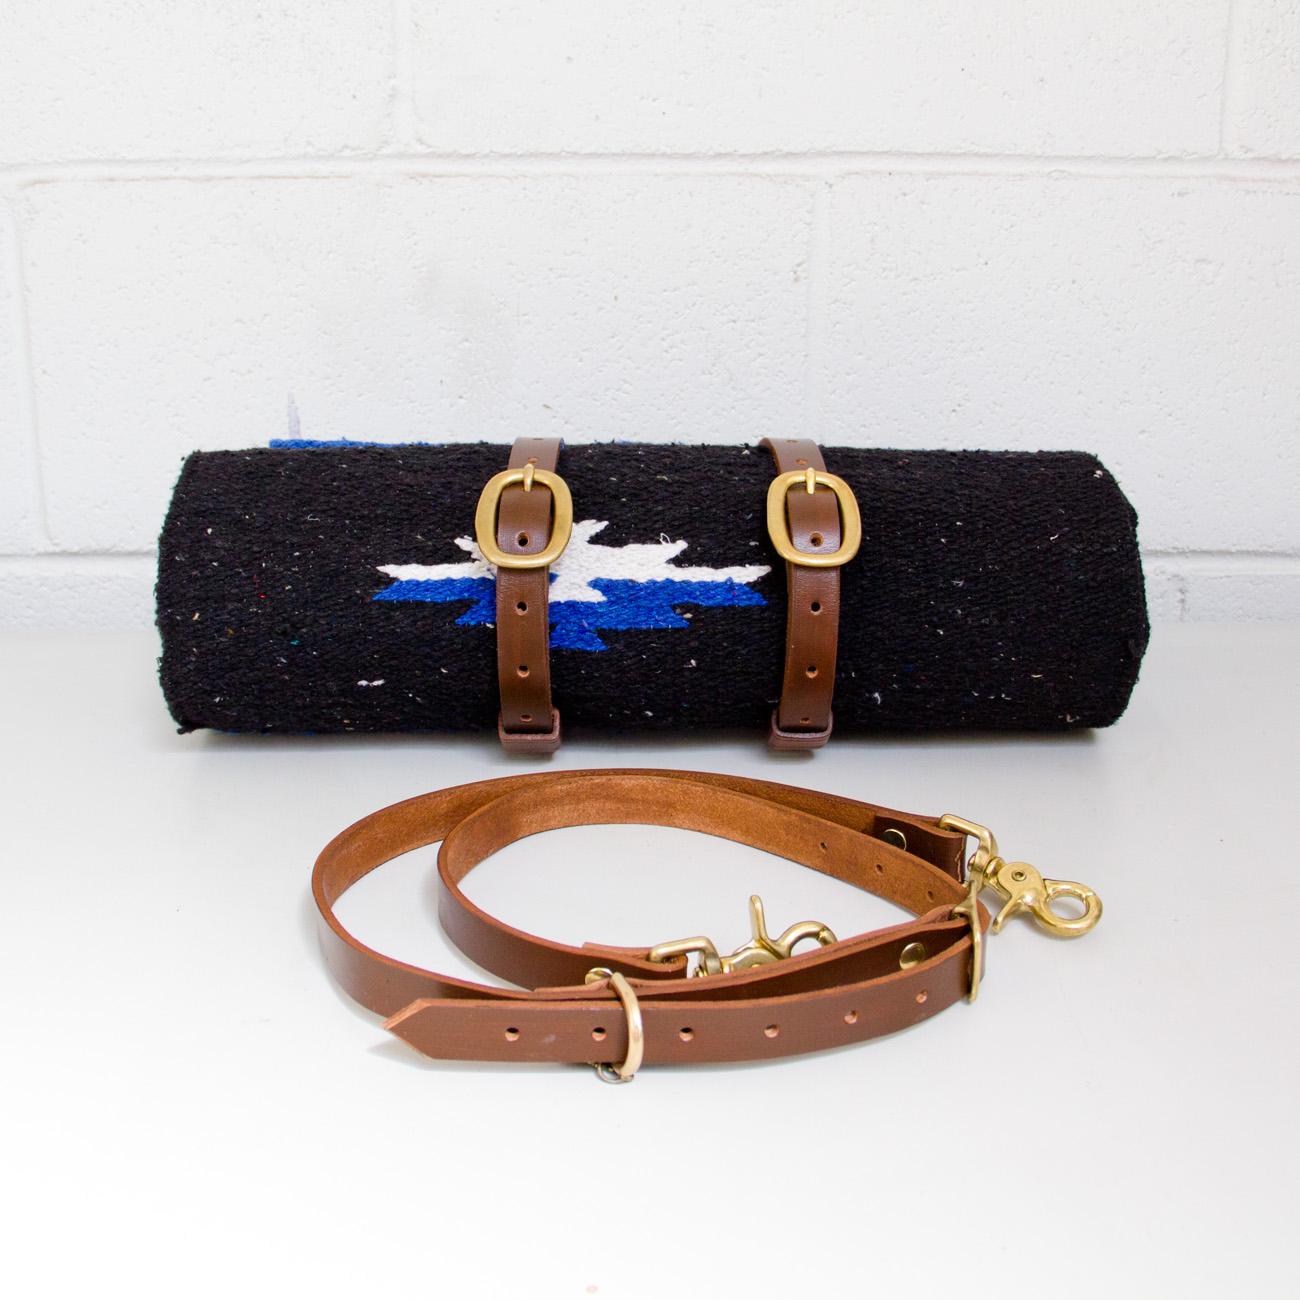 ml-blanket-harness_6367-1300px